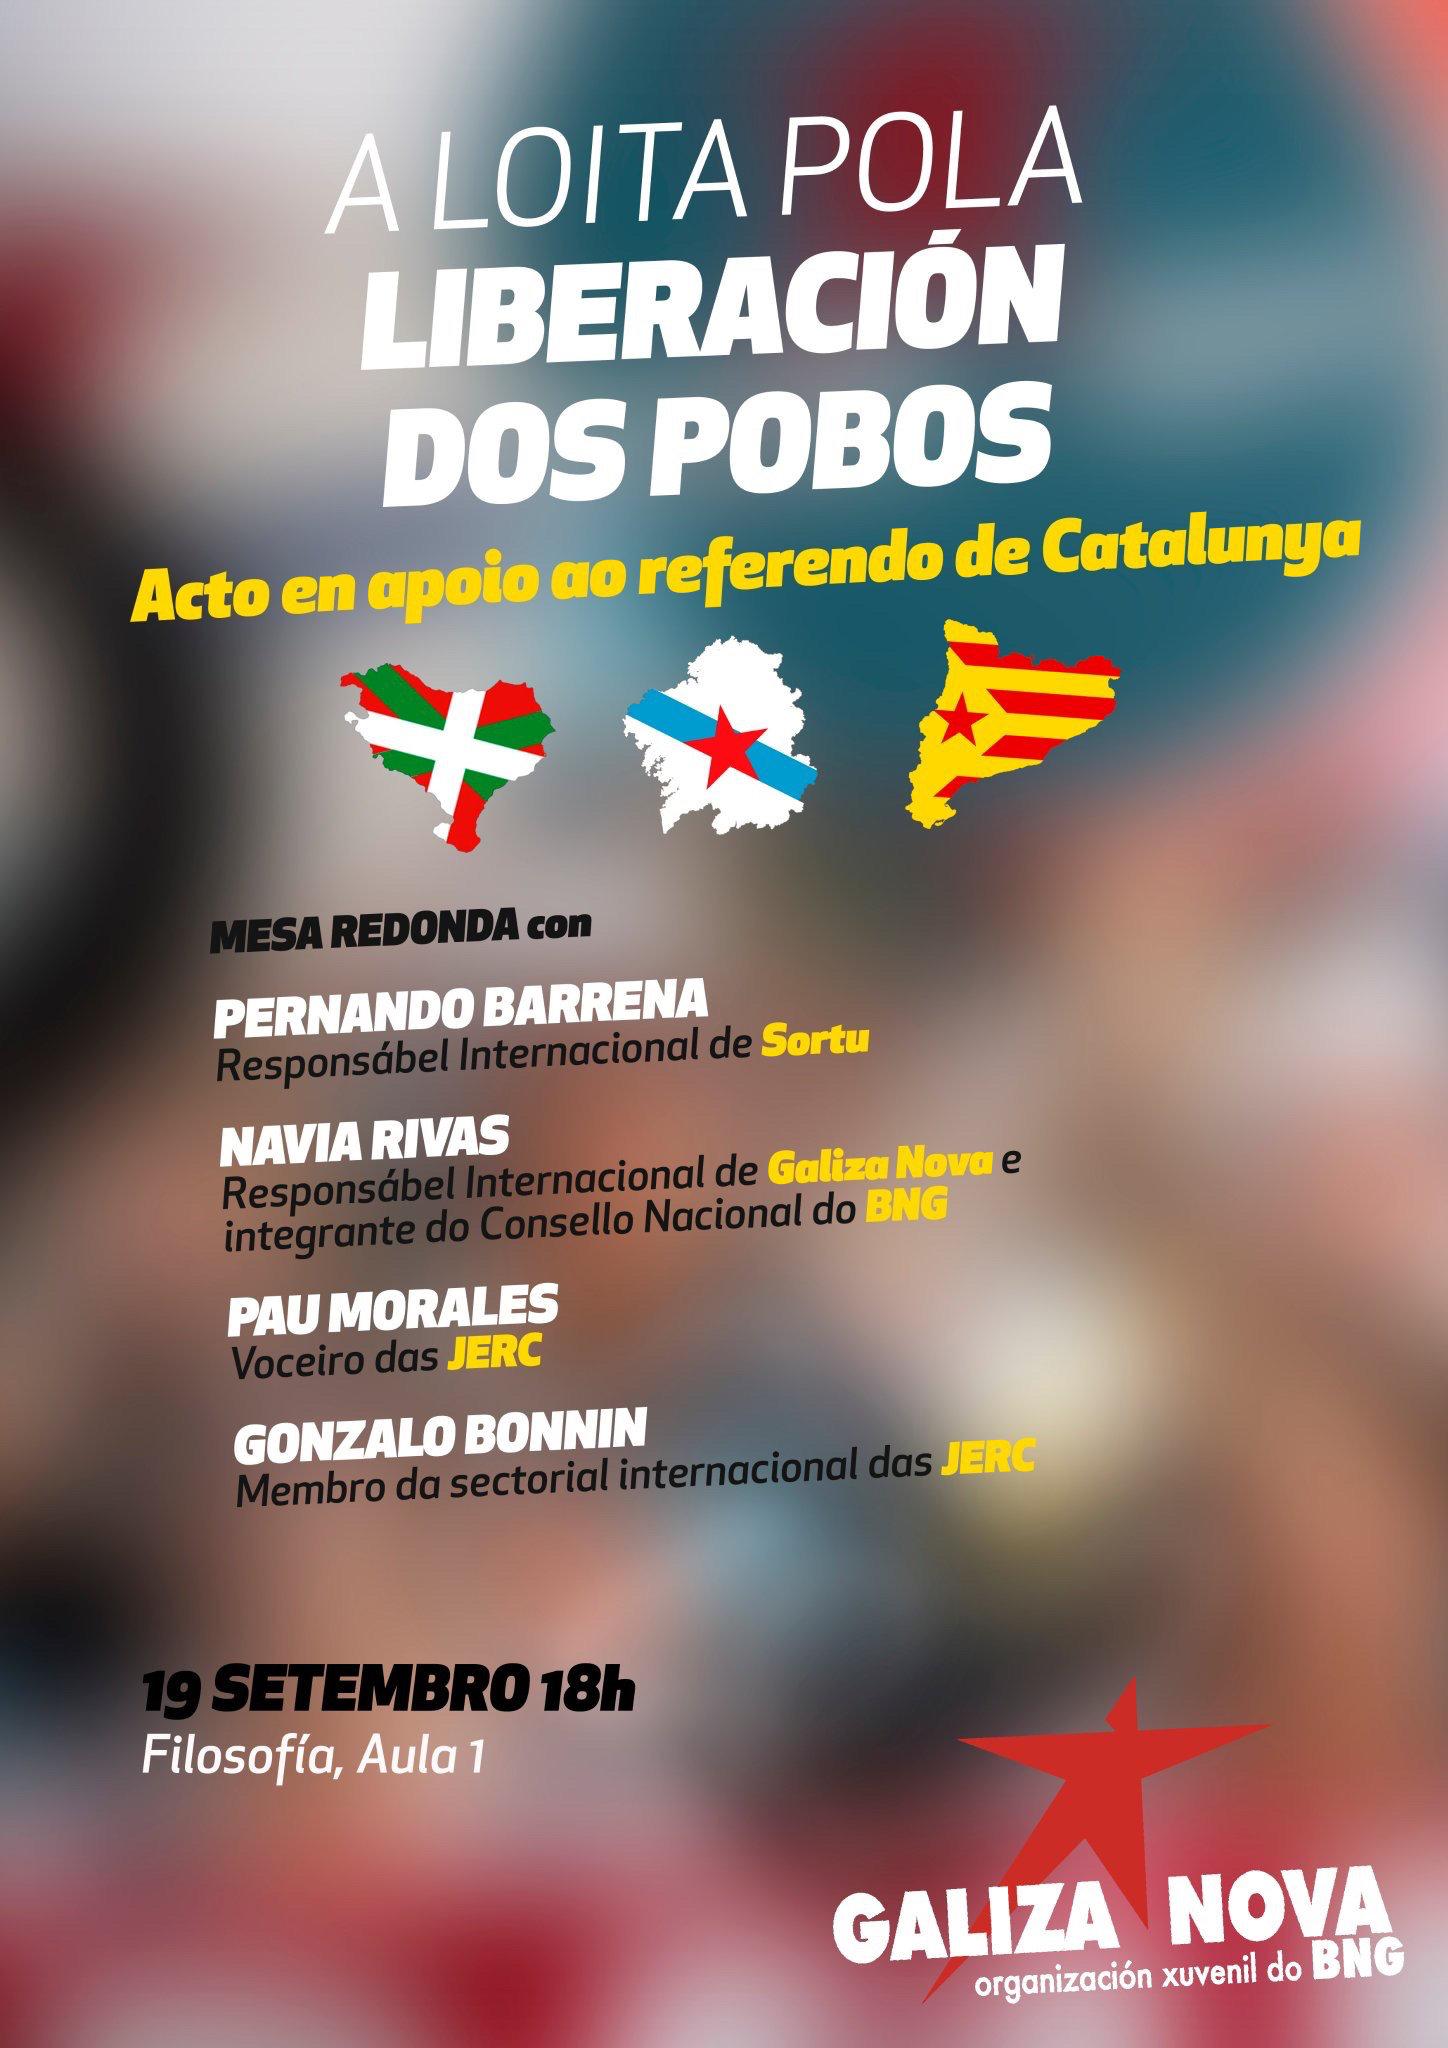 Acto en apoio ao referendo de Catalunya